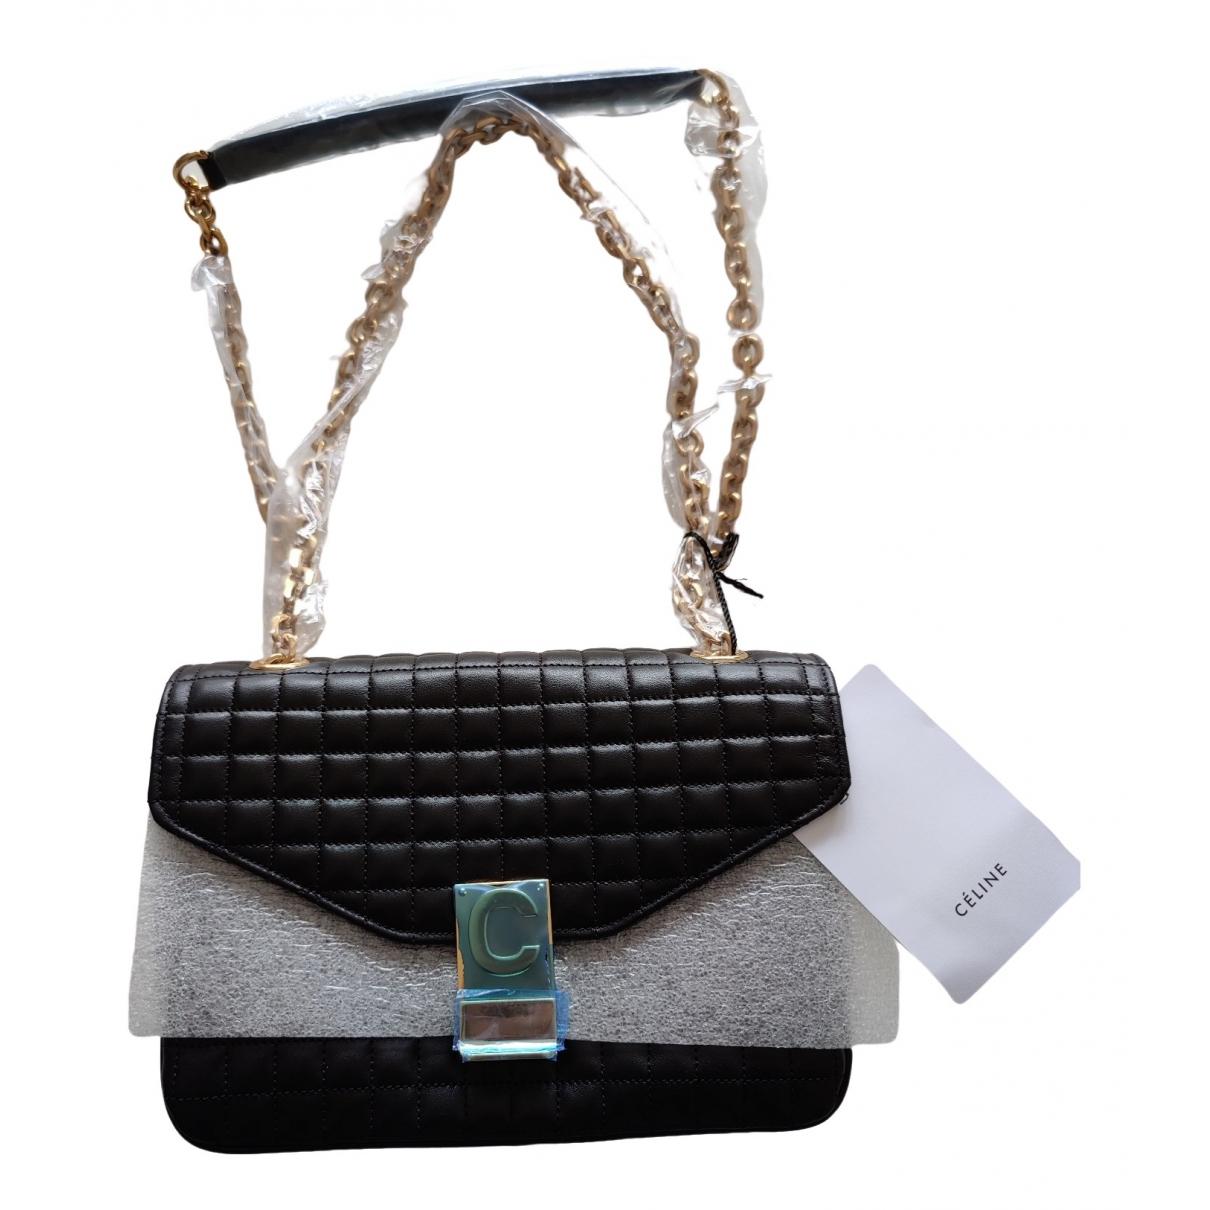 Celine C bag Handtasche in  Schwarz Leder